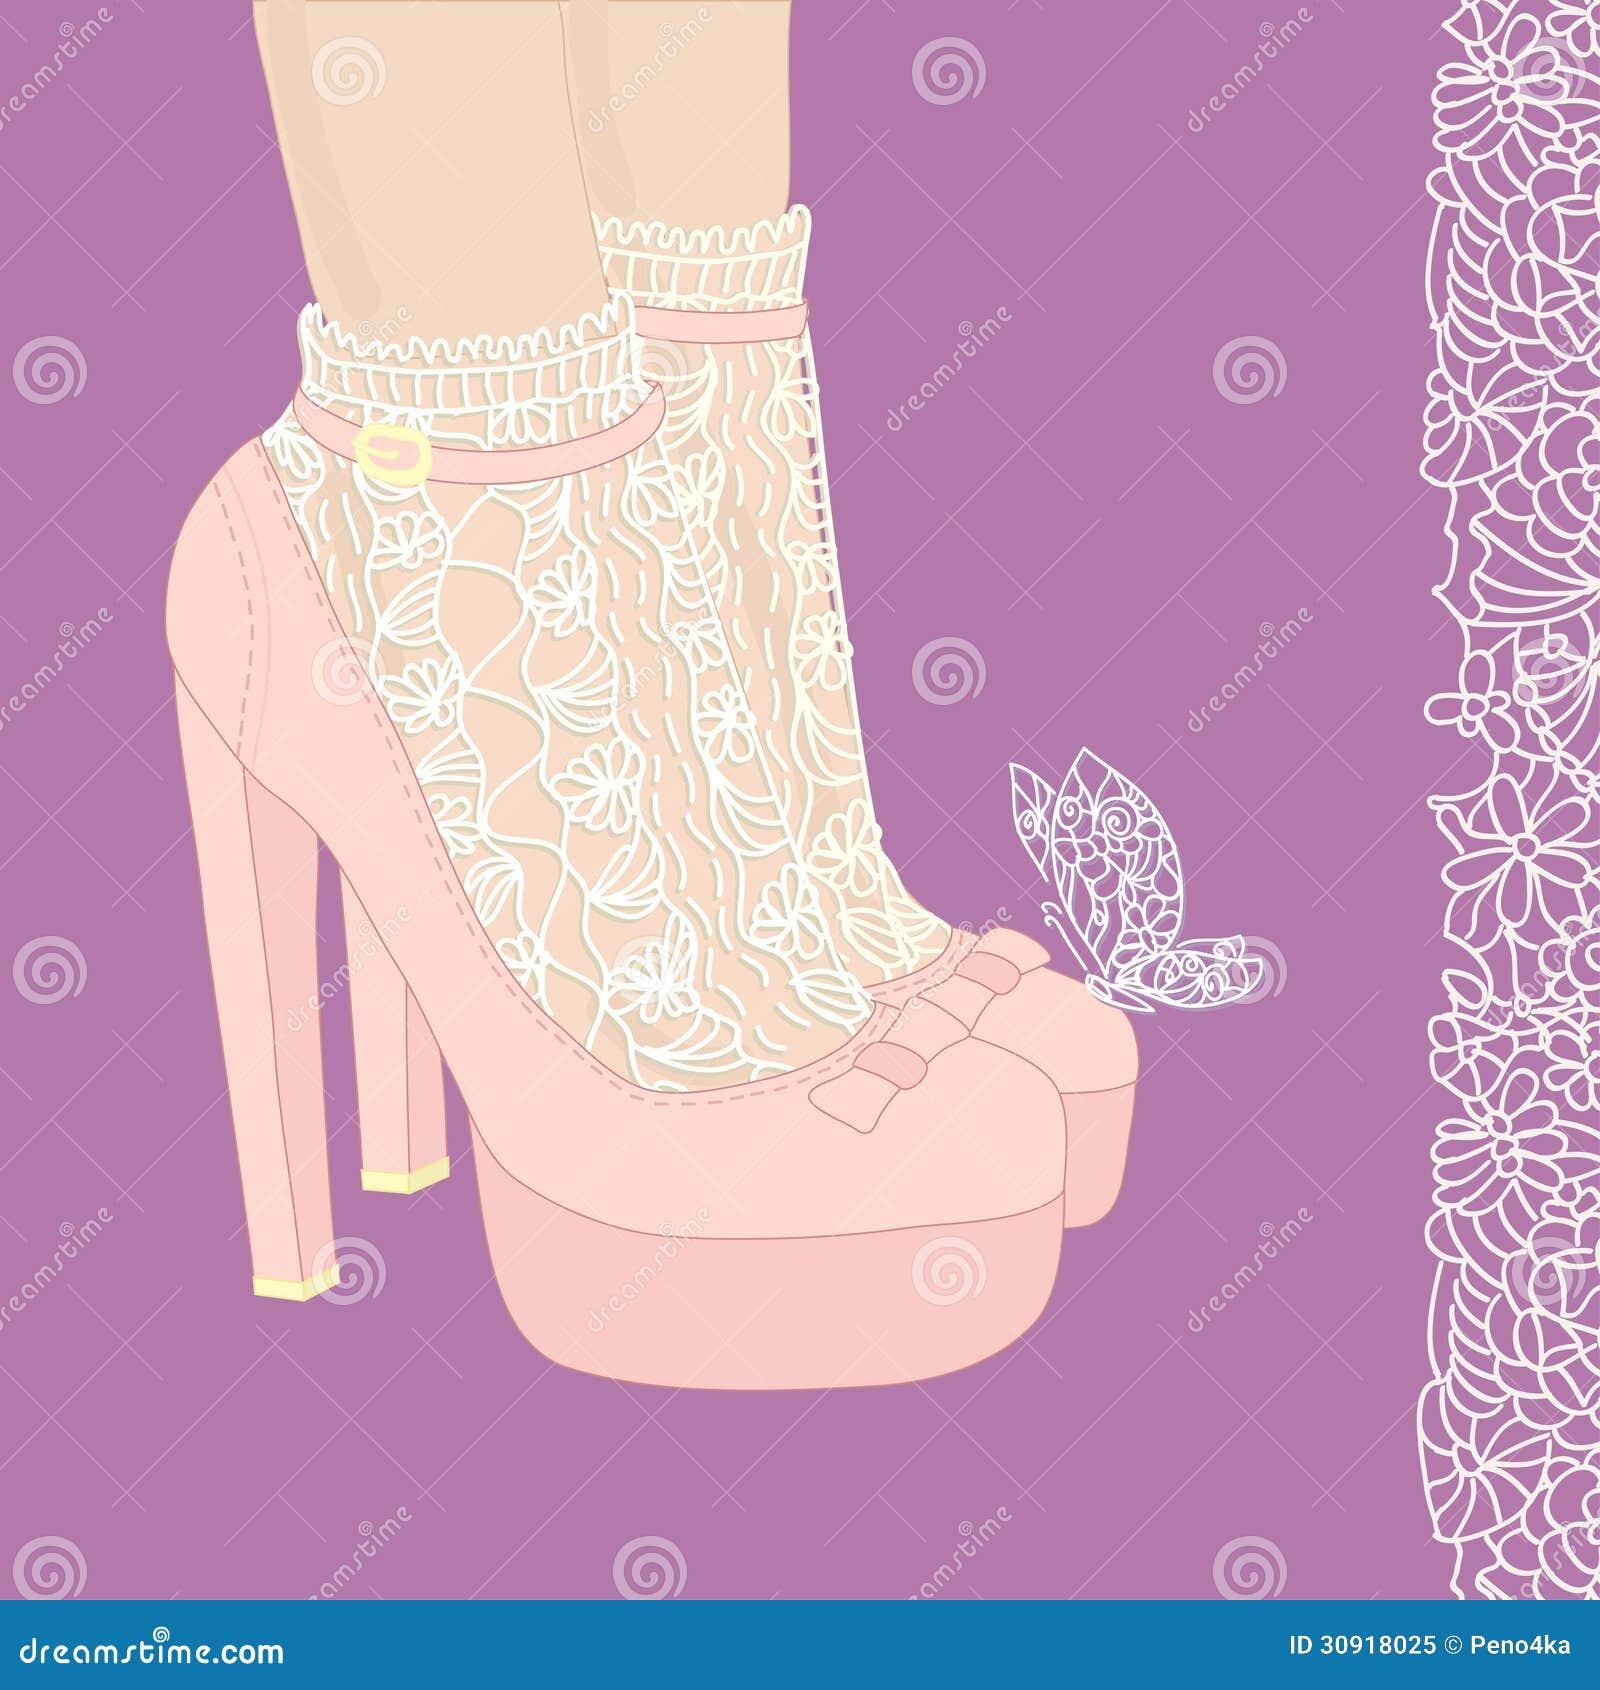 High Heel Shoes In Pink